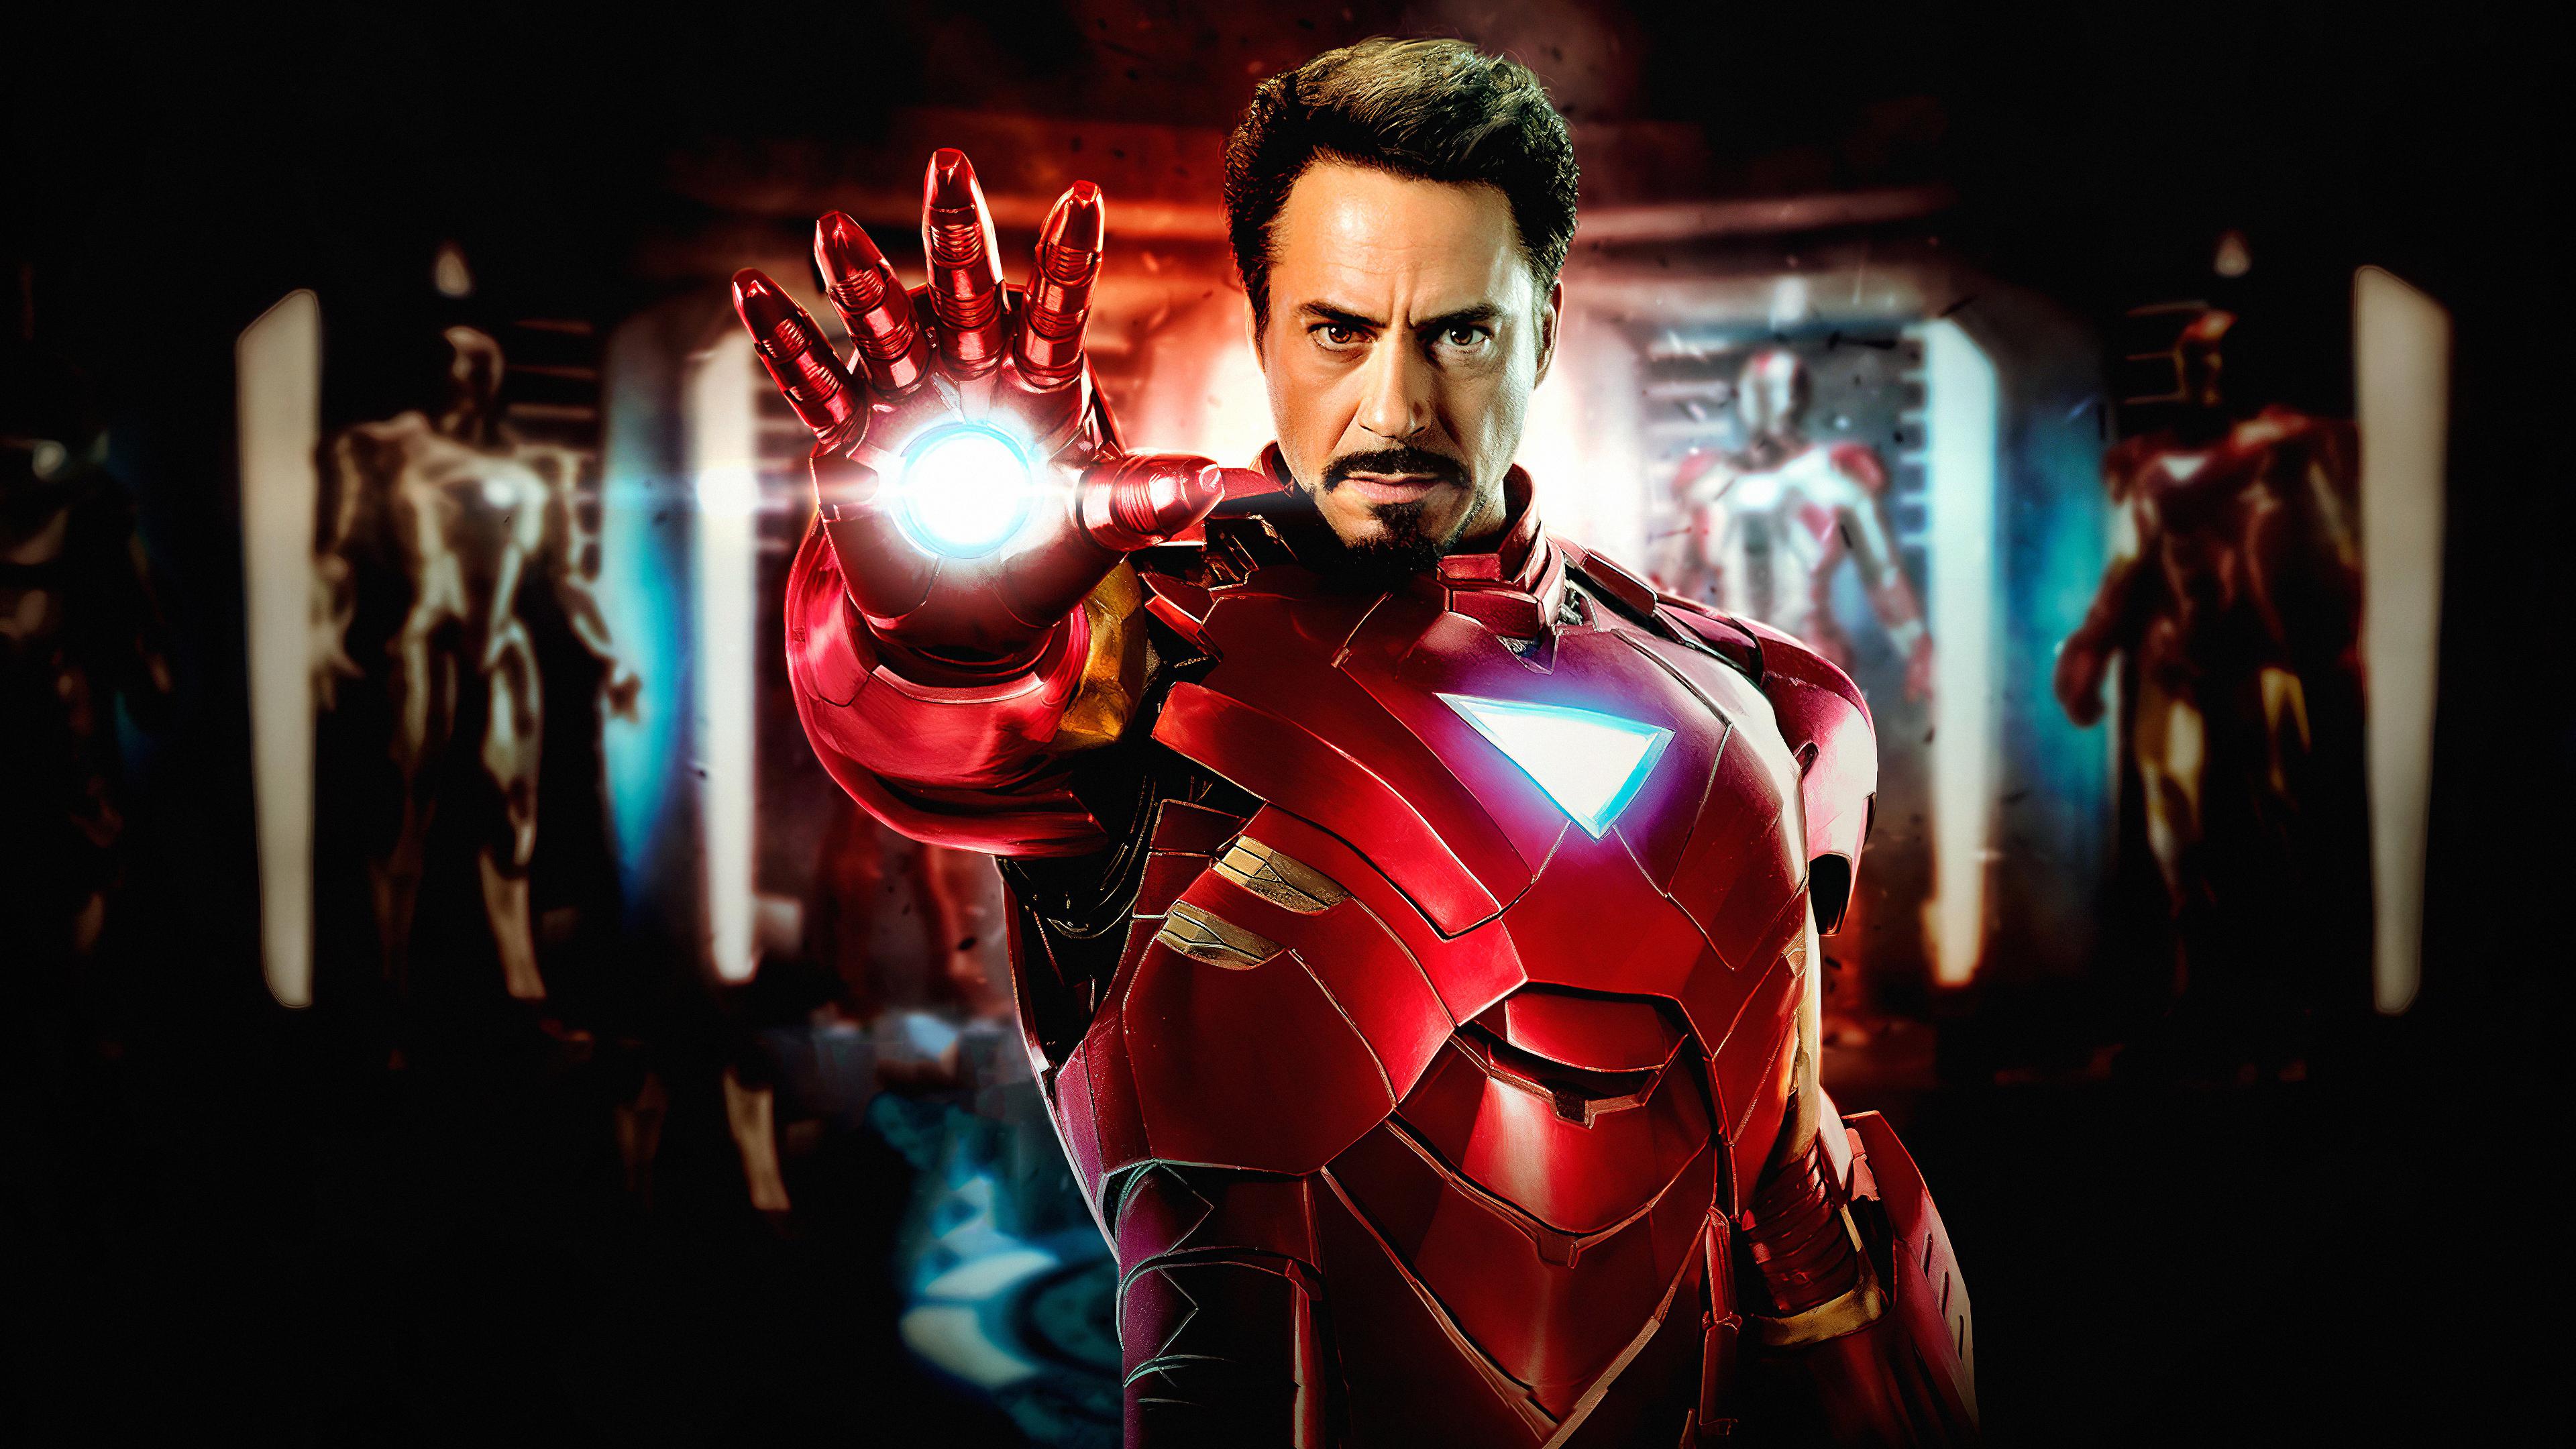 iron man robert downey jr art 1576093362 - Iron Man robert downey jr Art - iron man wallpaper phone hd 4k, iron man wallpaper 4k, iron man 4k hd wallpaper